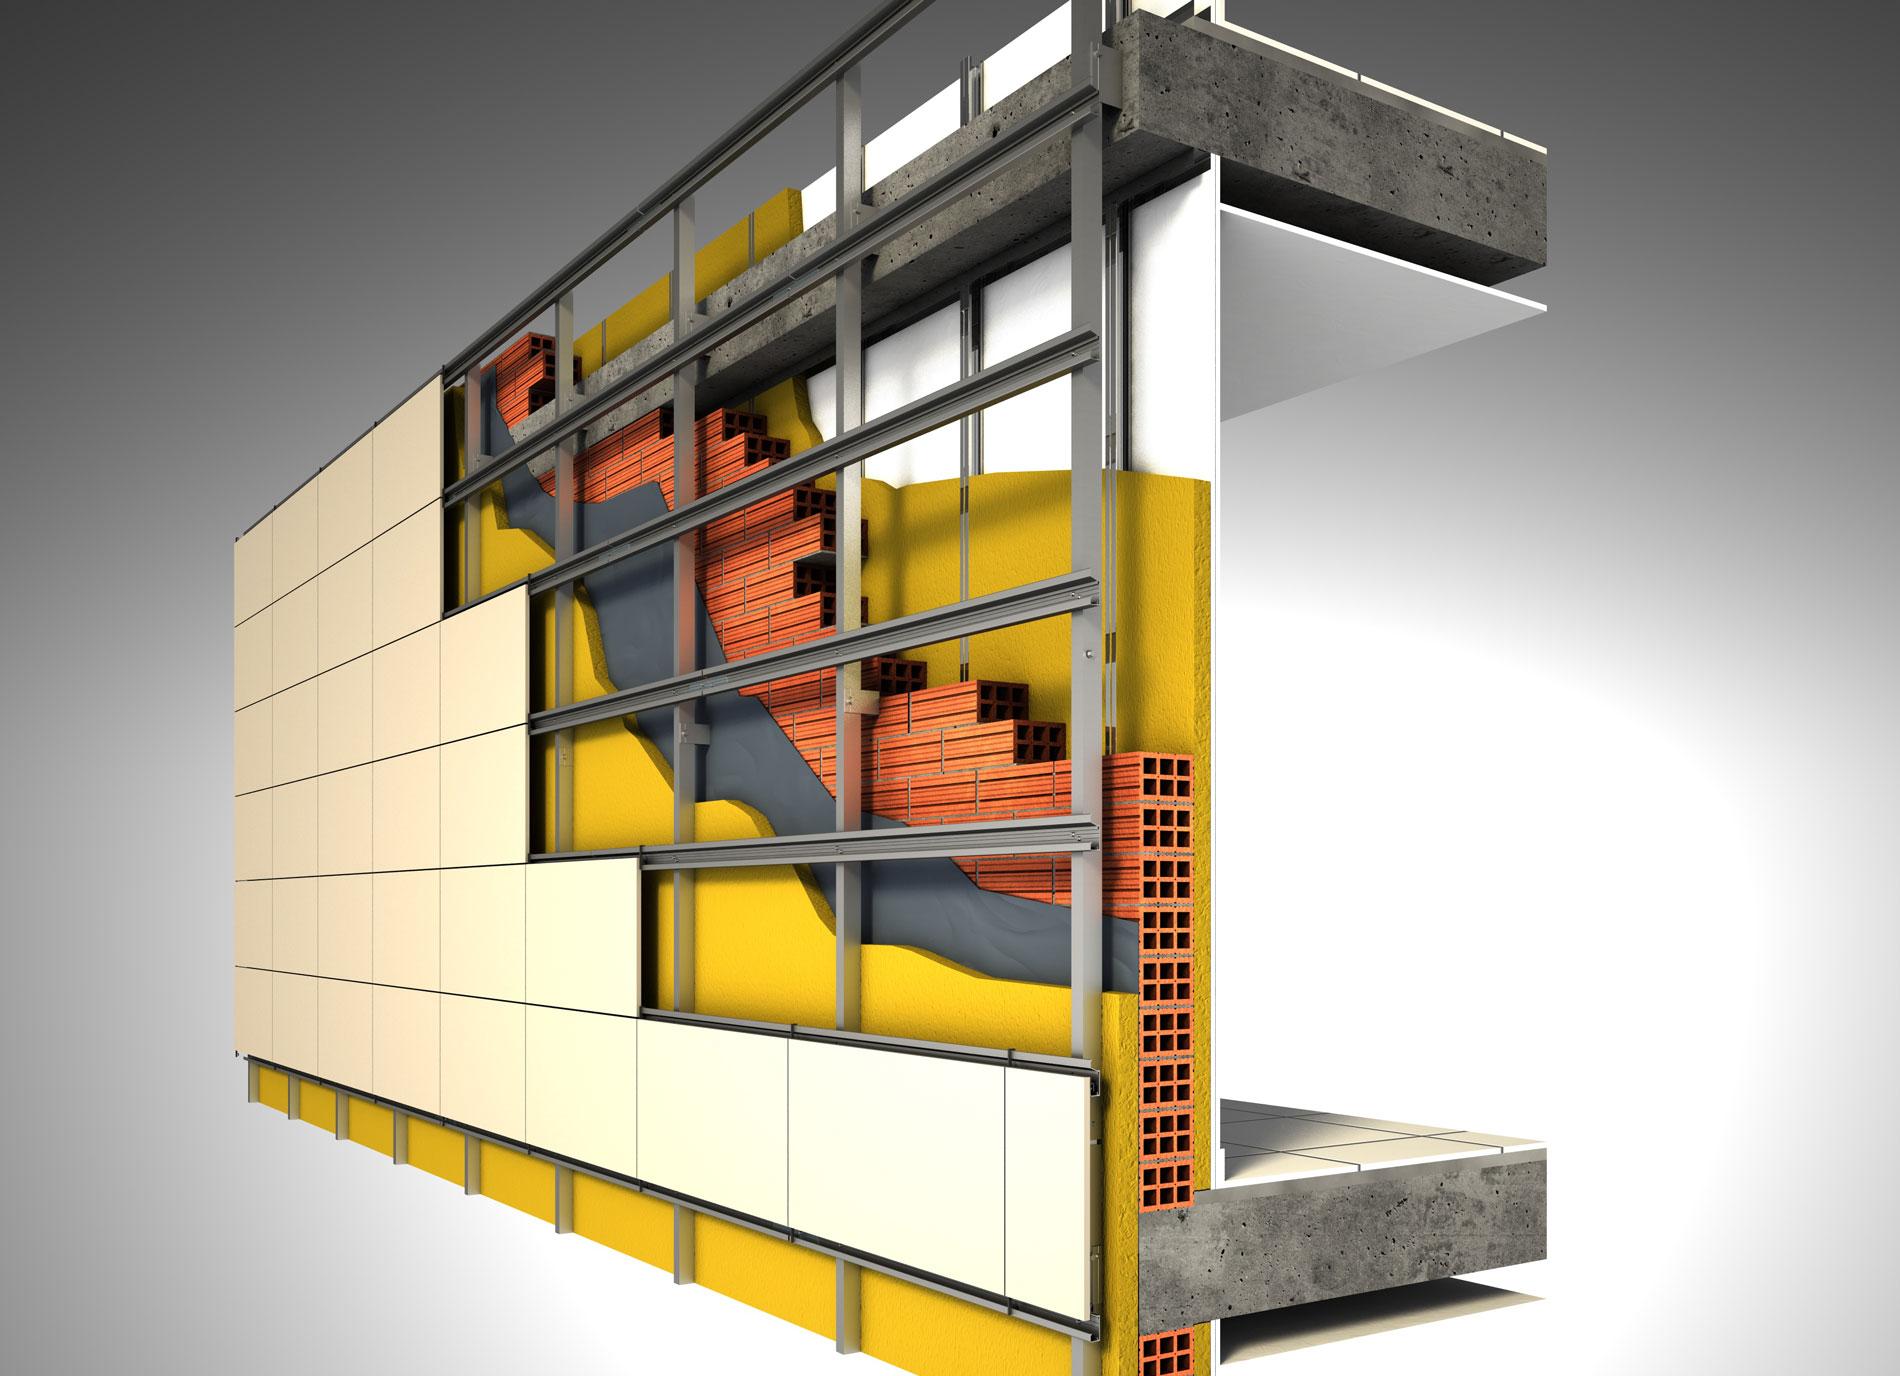 Fachada ventilada barata materiales de construcci n para - Materiales de construccion baratos ...